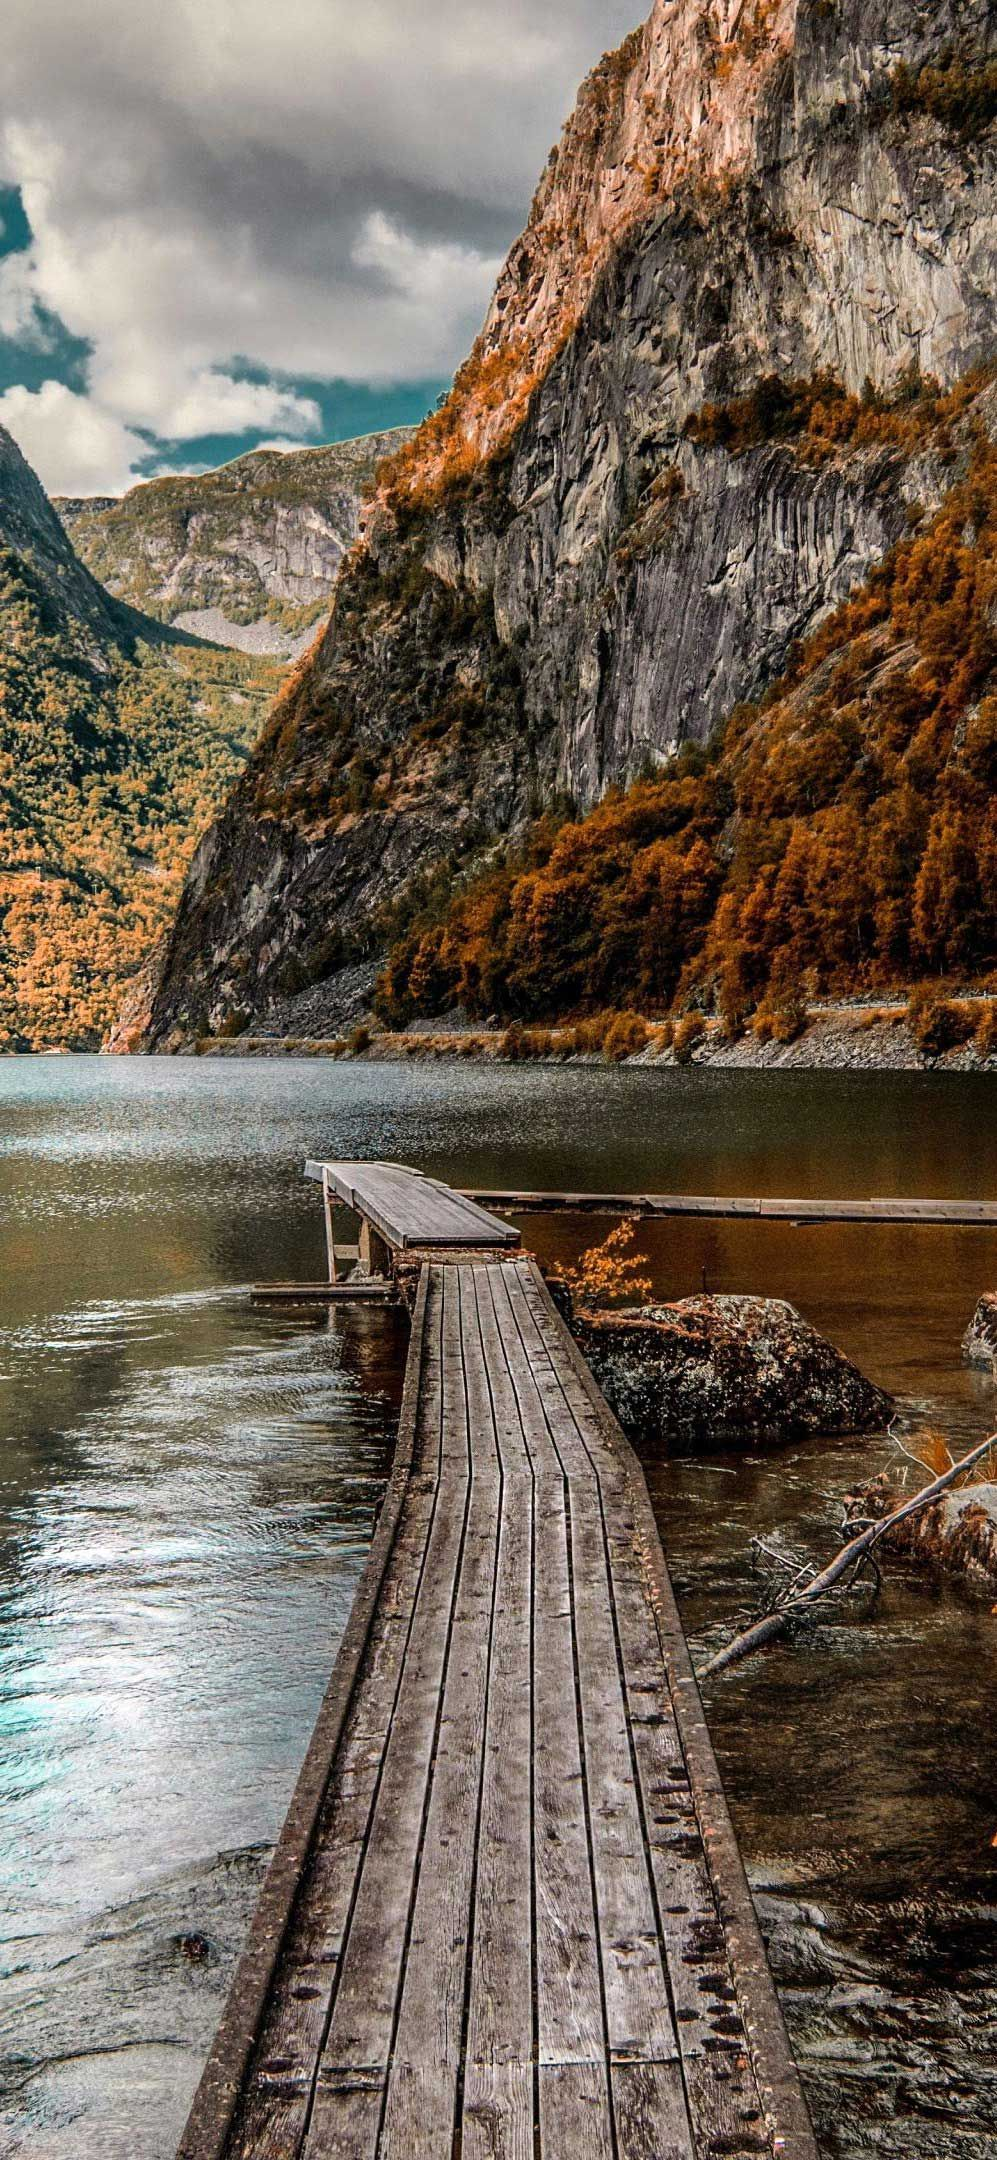 Iphone Pro Wallpaper Mountains wooden dock lake autumn